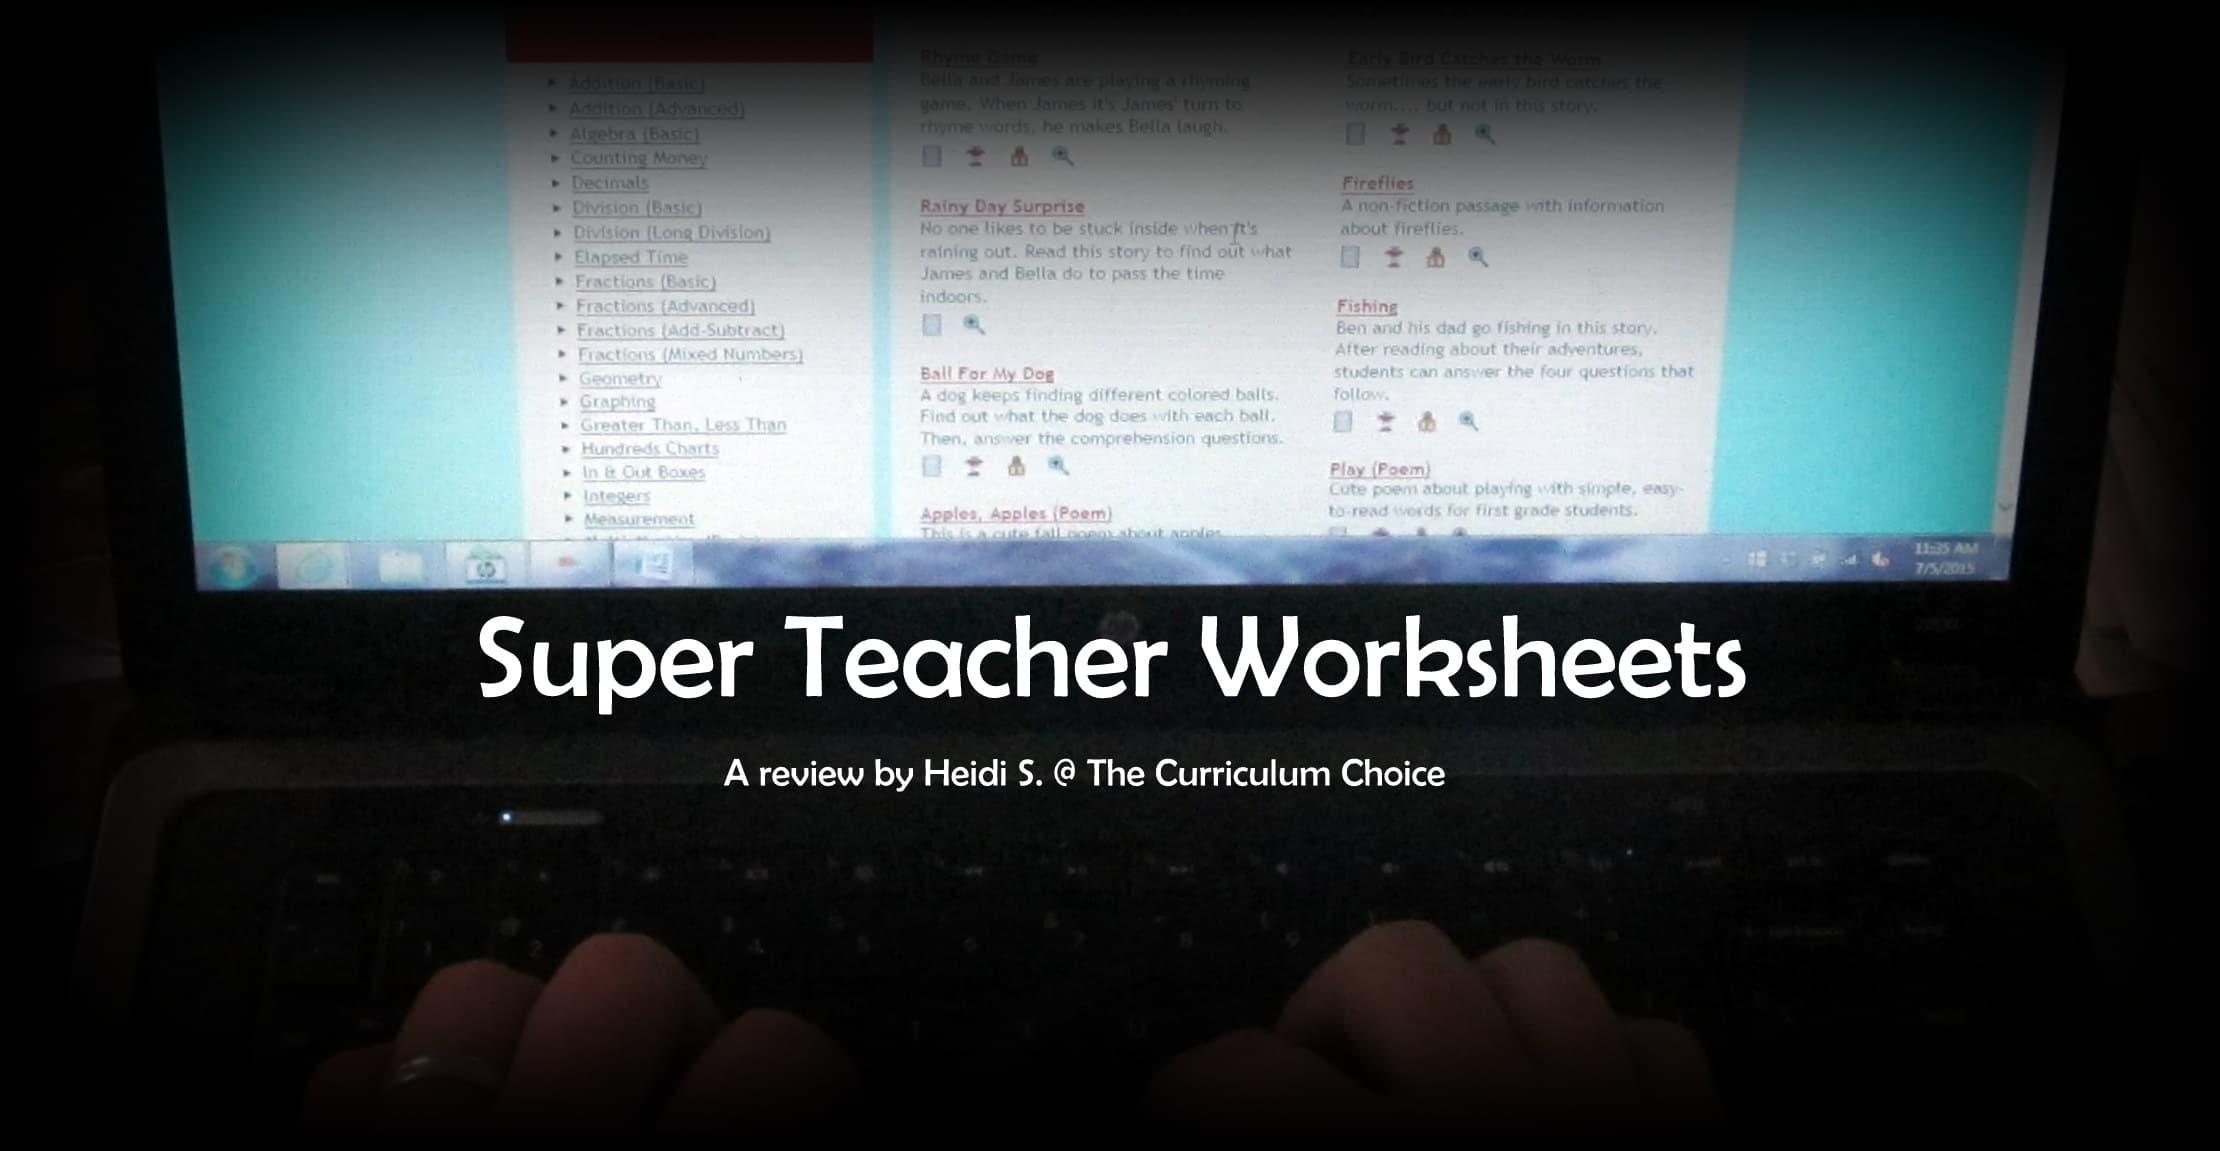 Super Teacher Worksheets A Review The Curriculum Choice